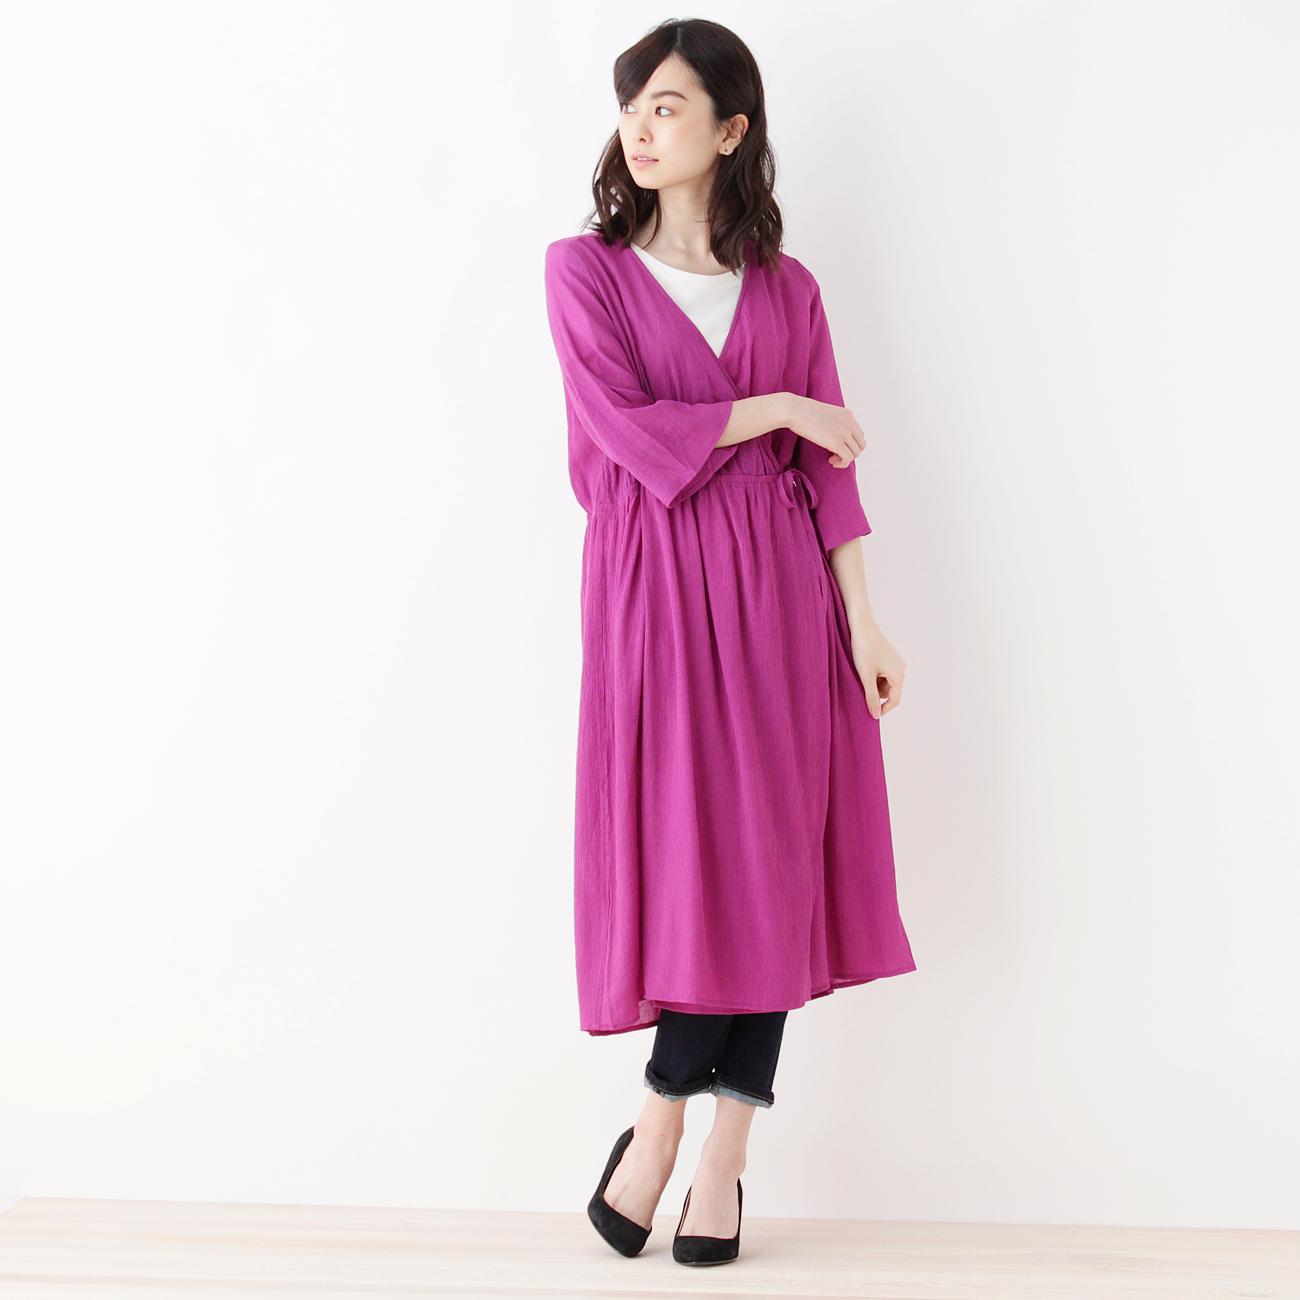 【index (インデックス)】2WAY楊柳ワンピースレディース ワンピース|ワンピース ピンク系